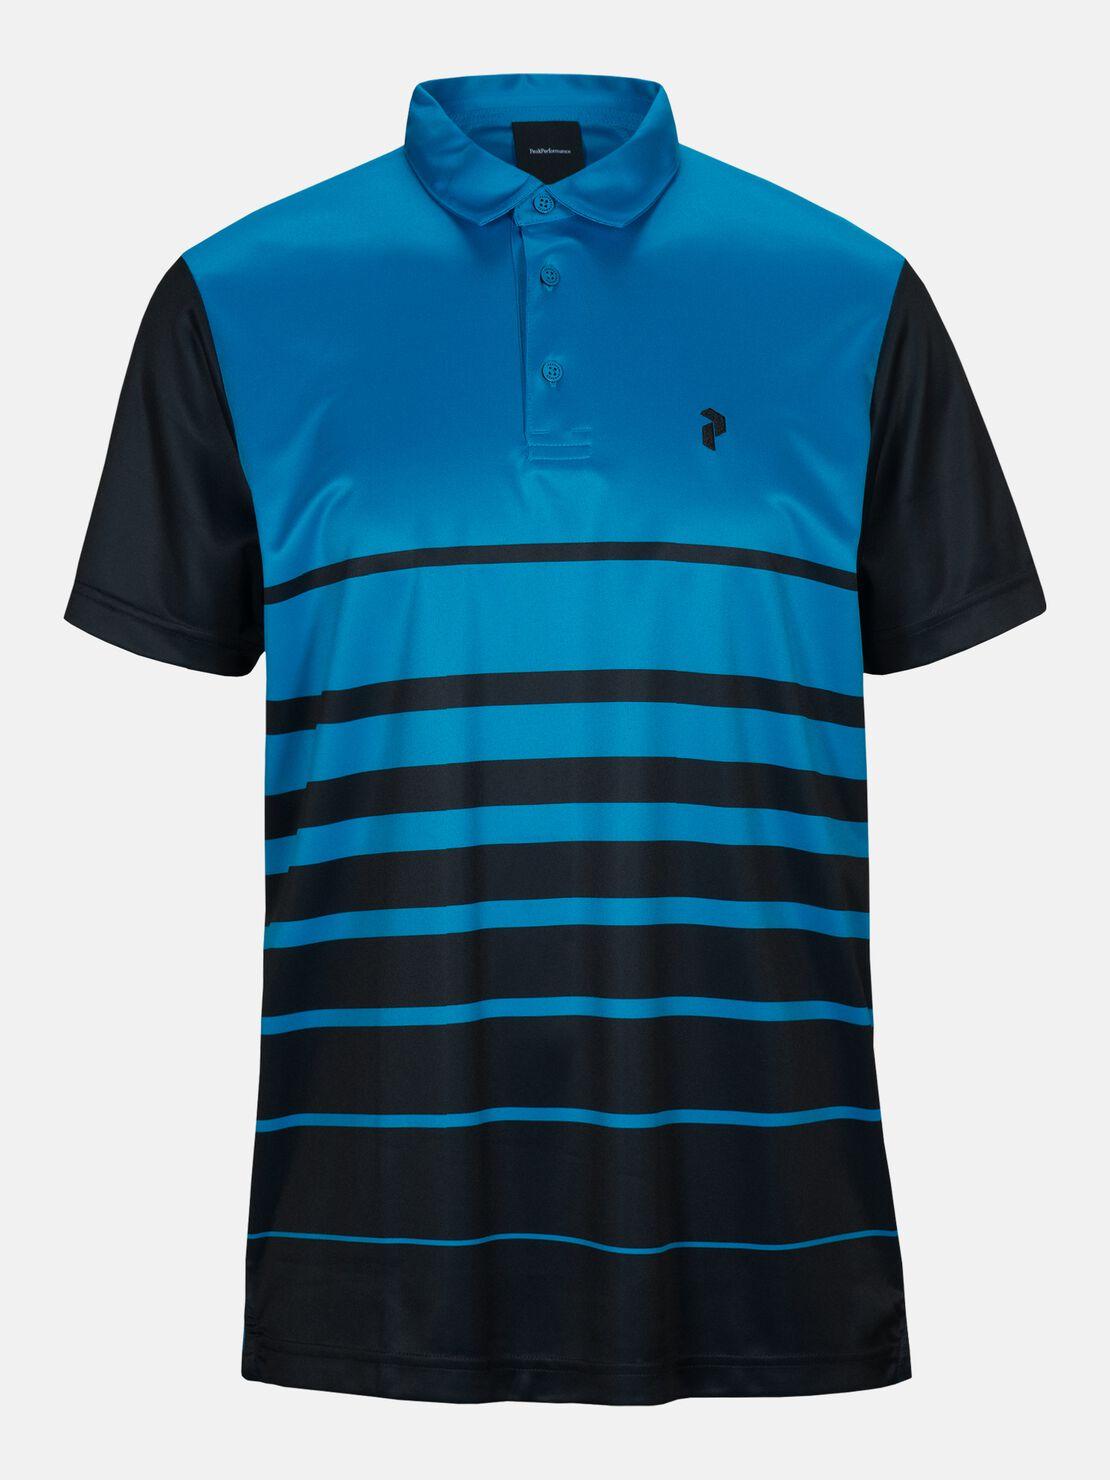 Peak Performance Golf Bandon Print Polo Clay Red